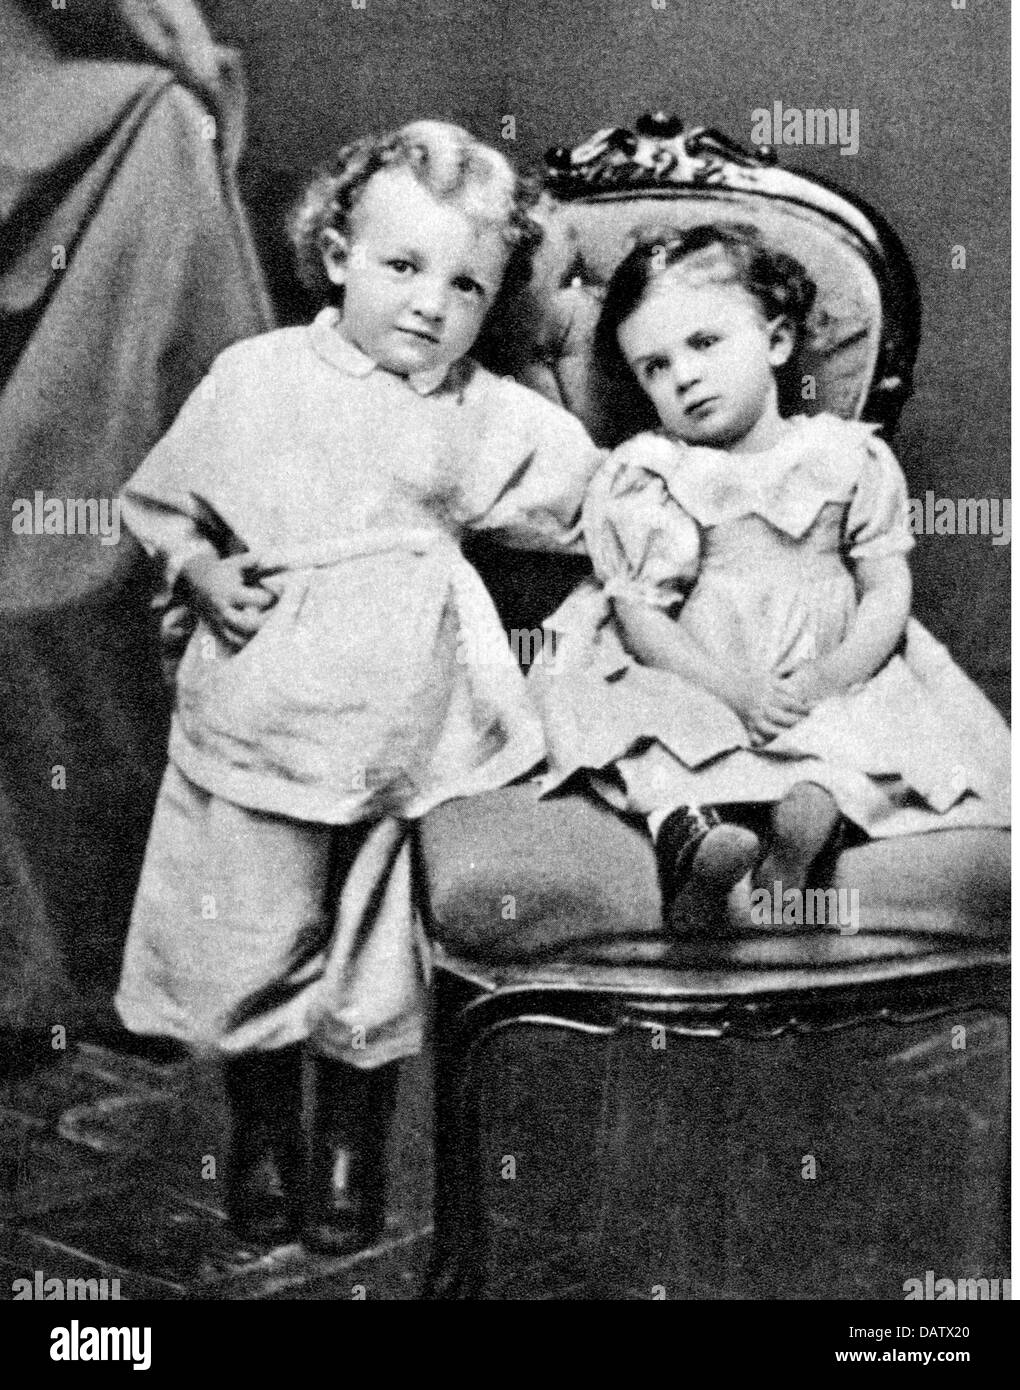 Lenin (Vladimir Ilyich Ulyanov), 22.4.1870 - 21.1.1924, Russian politician, half length, as a child, with his sister Stock Photo